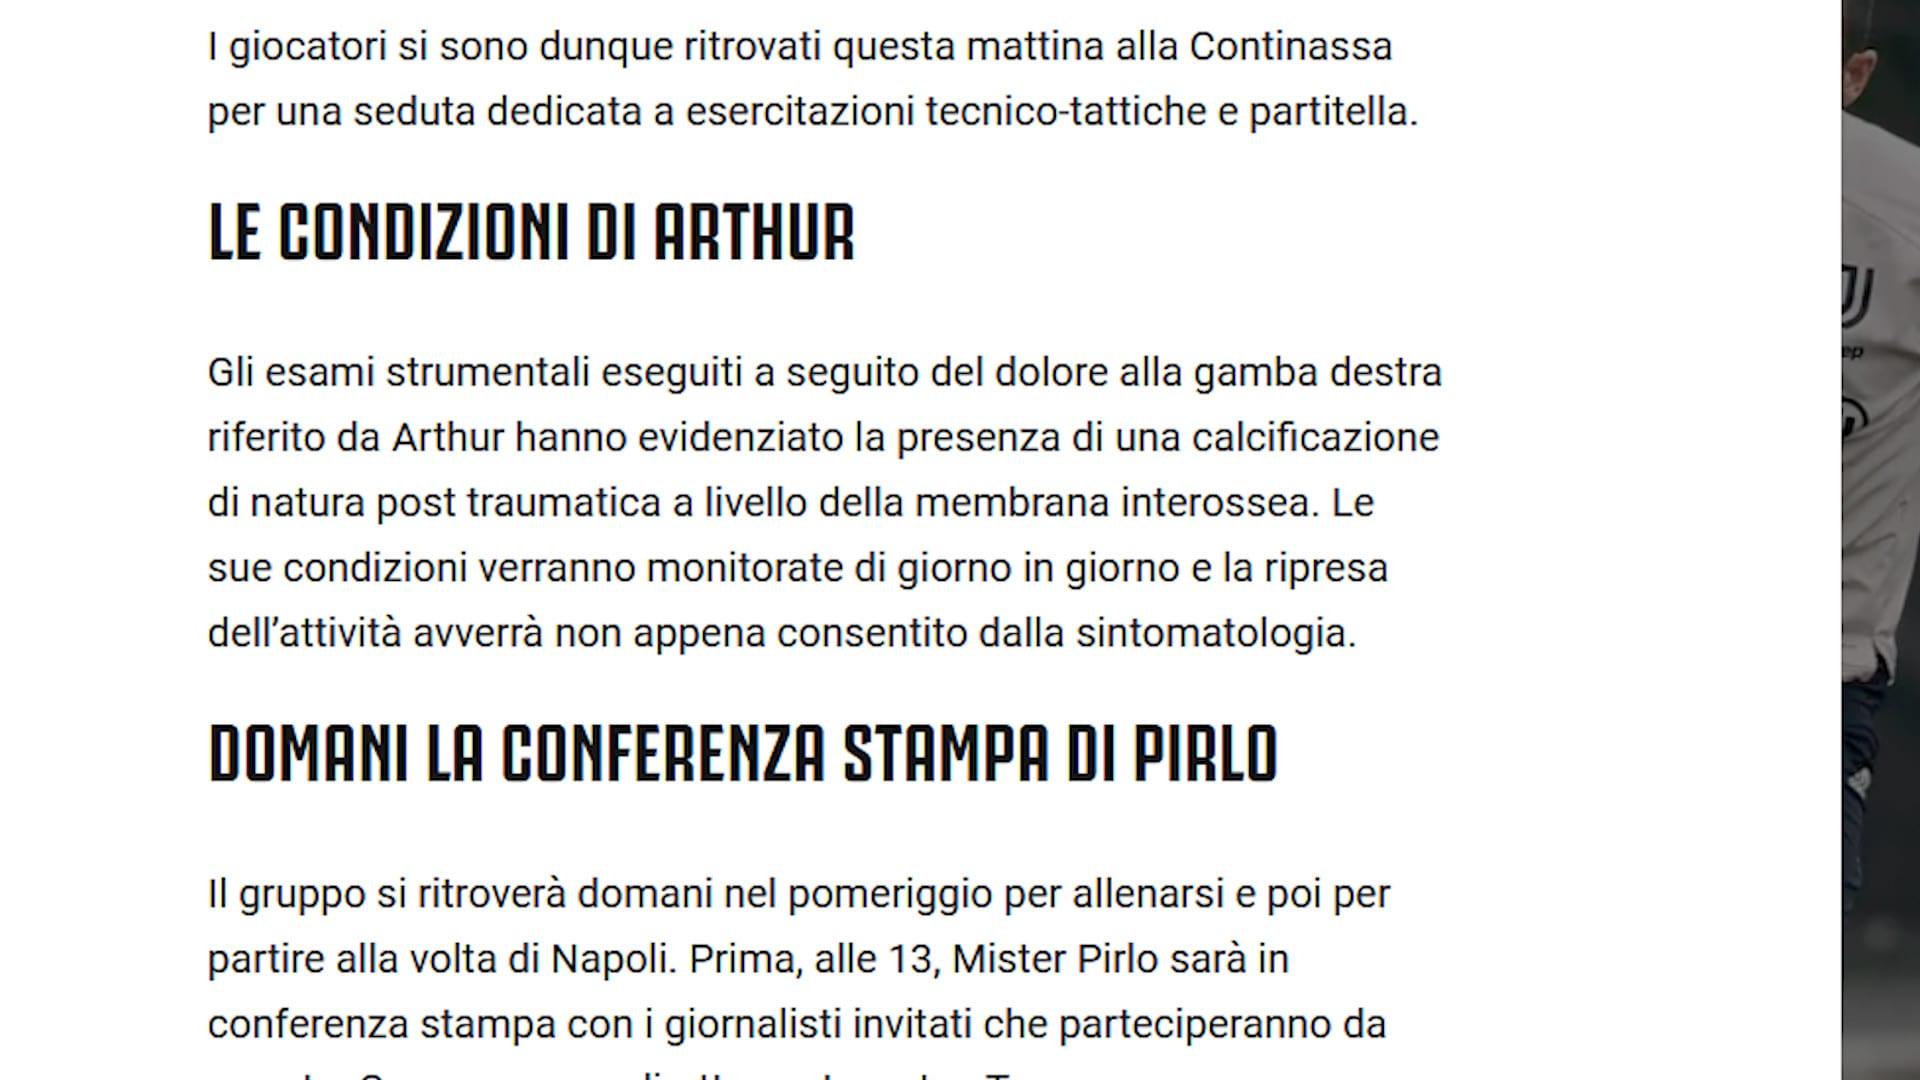 Juve, Arthur salta il Napoli